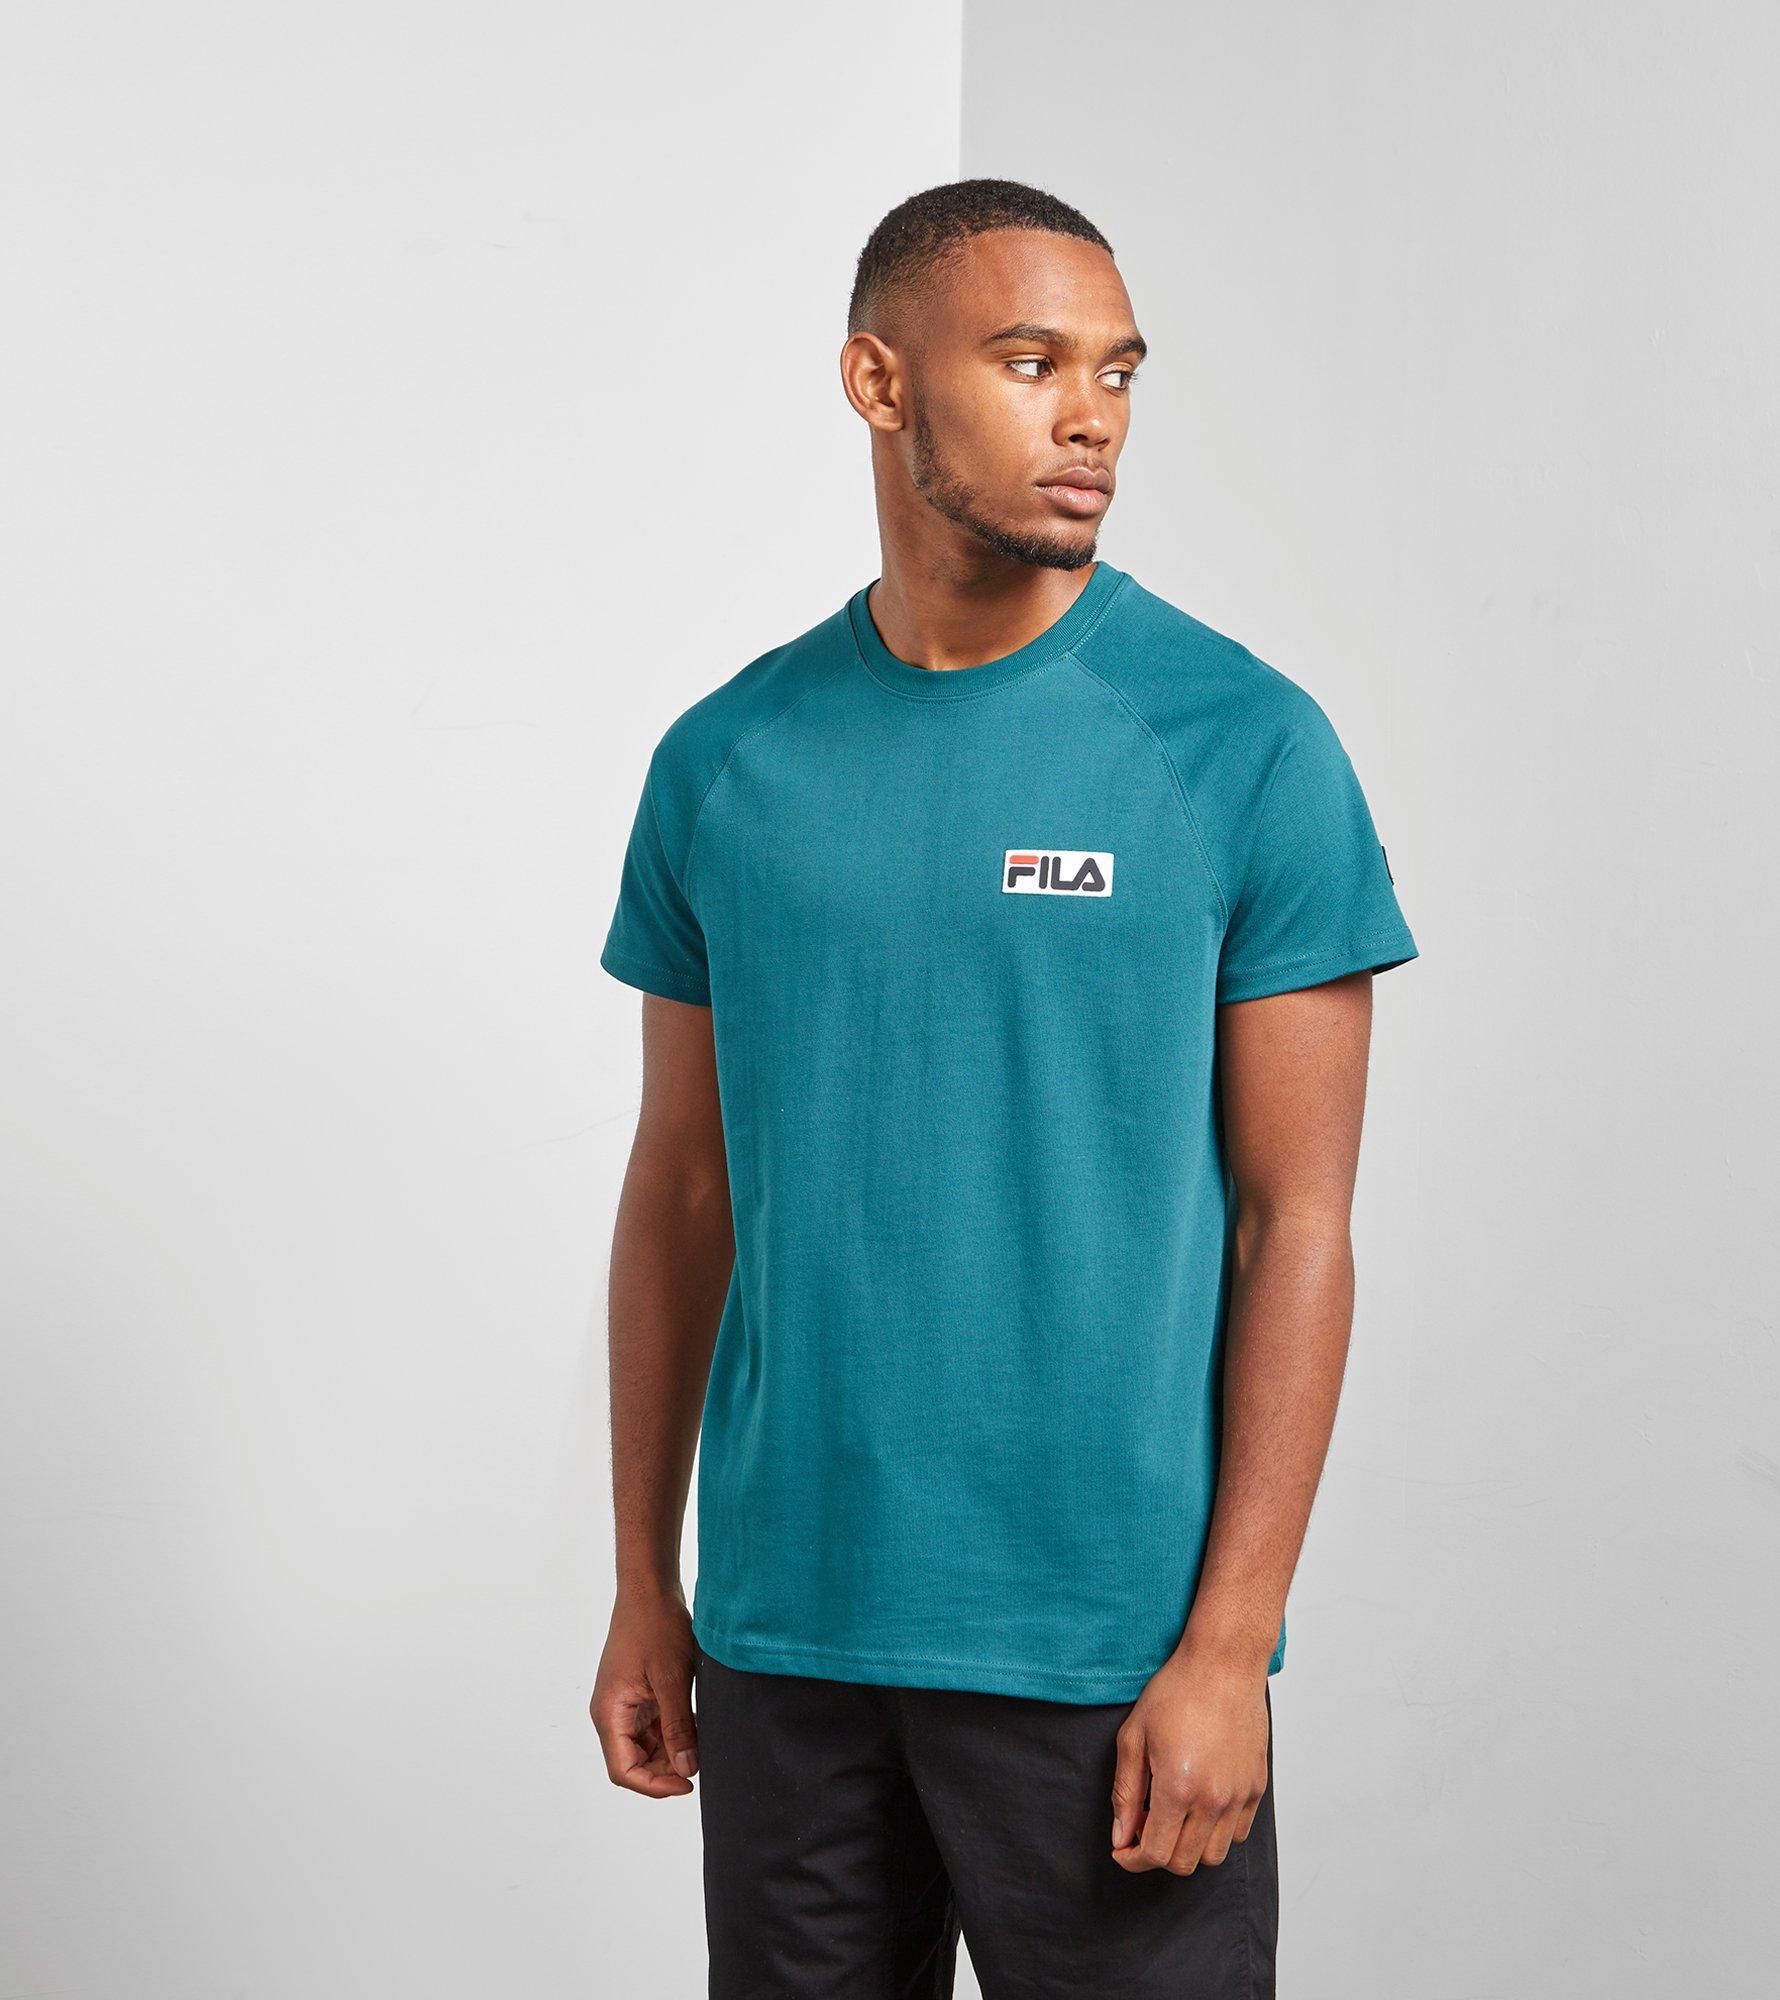 00608053183 Lyst - Fila Chia T-shirt in Green for Men